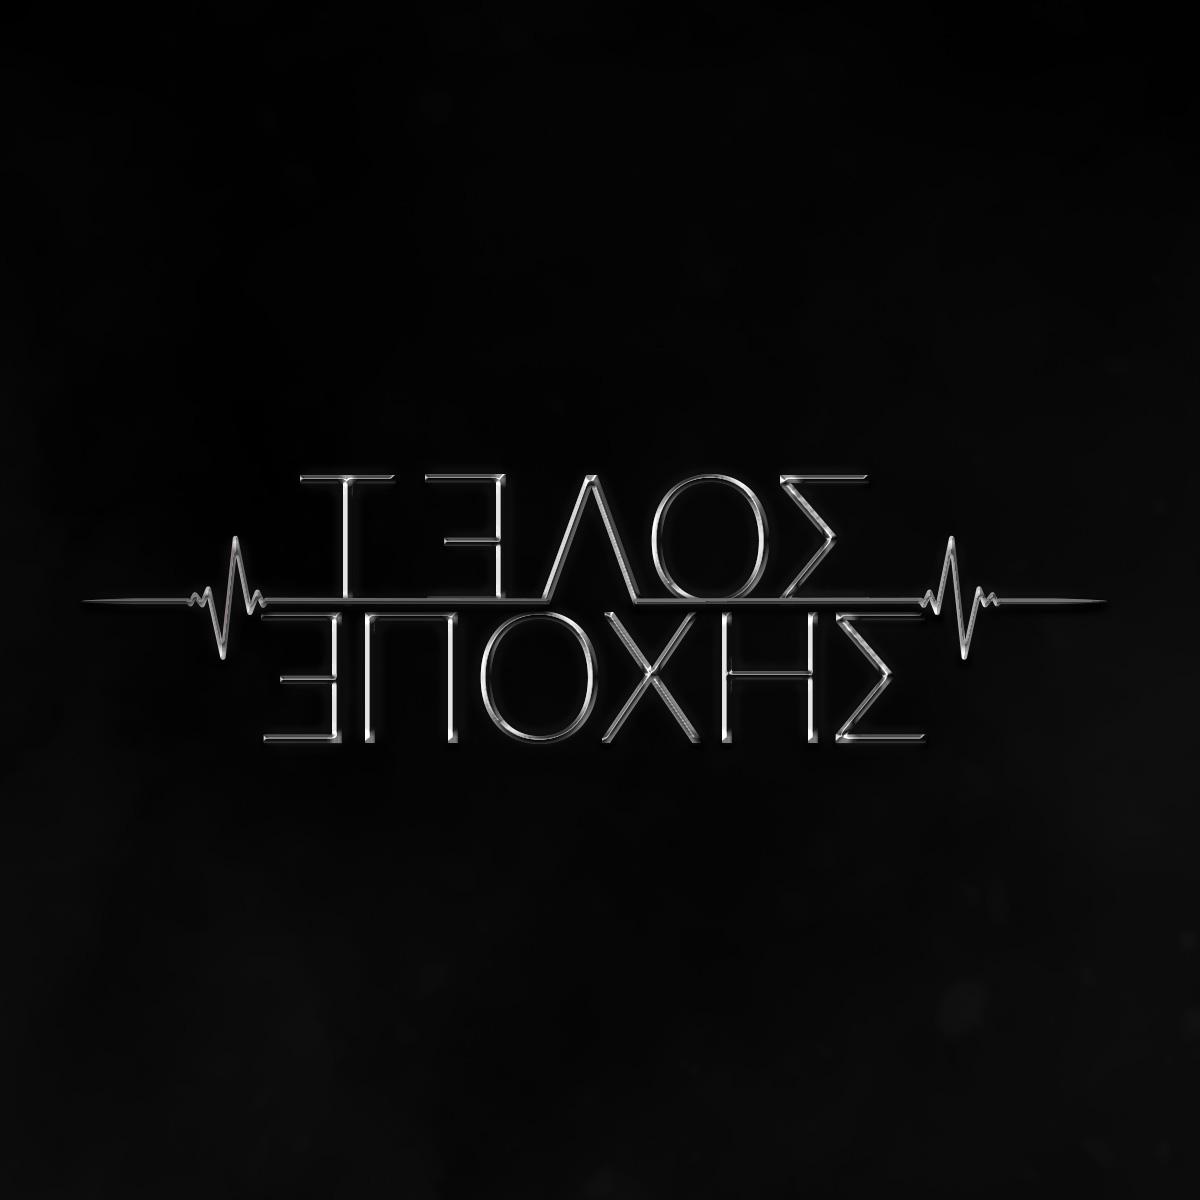 telos epoxis MIXALAS 5 logo band design by design spirit gr